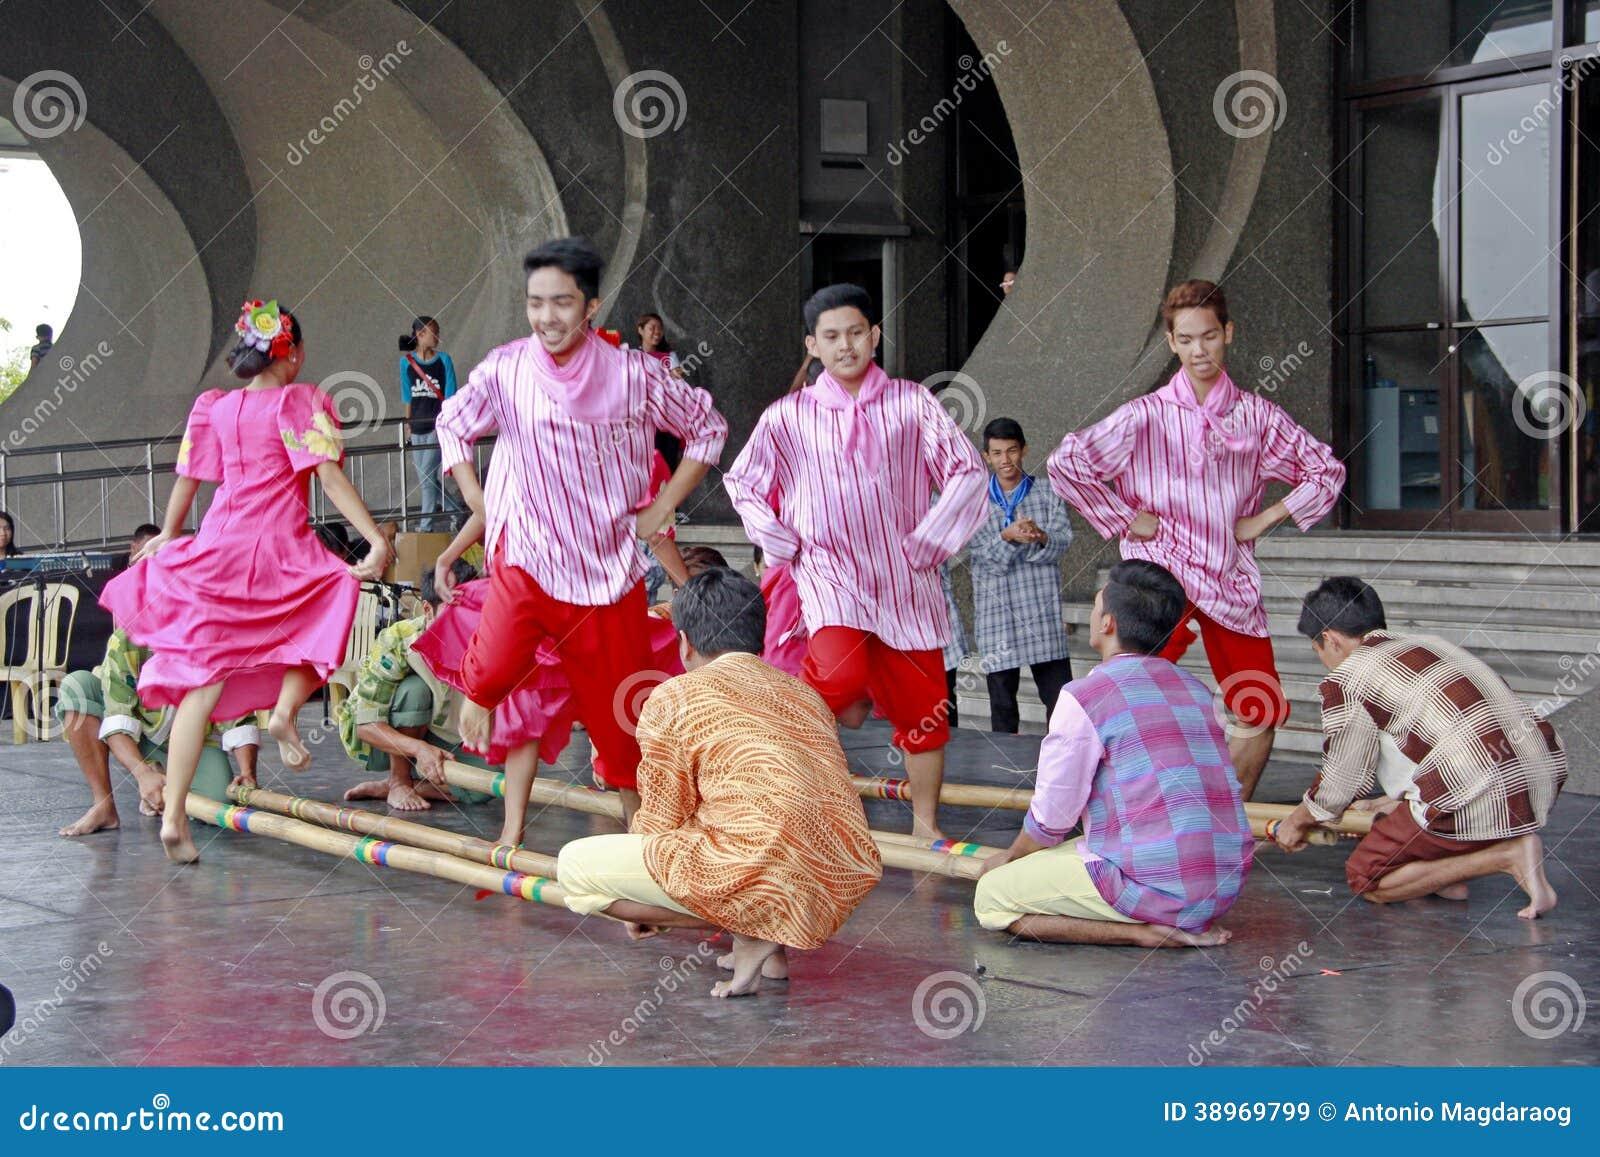 Danseur culturel